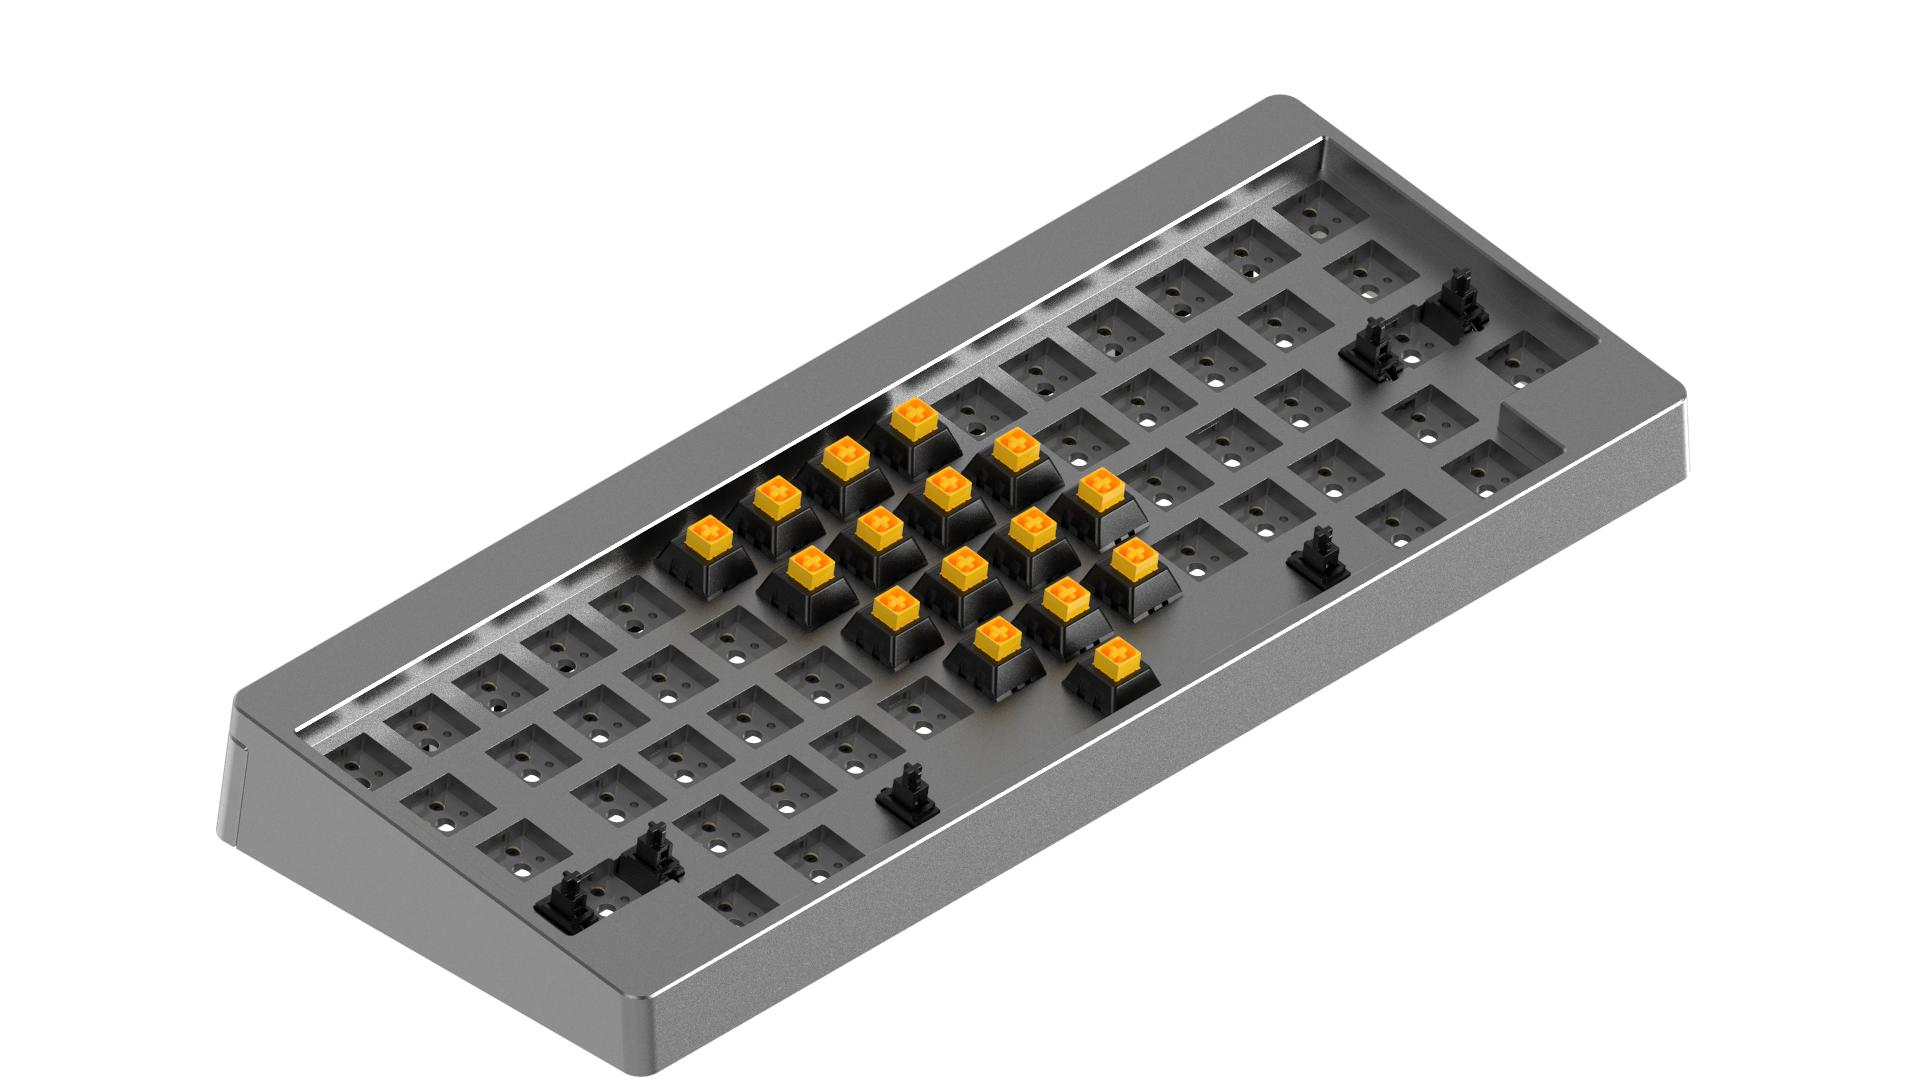 RW-M60-A-PCB-TROUBLESHOOT-01.1527.png